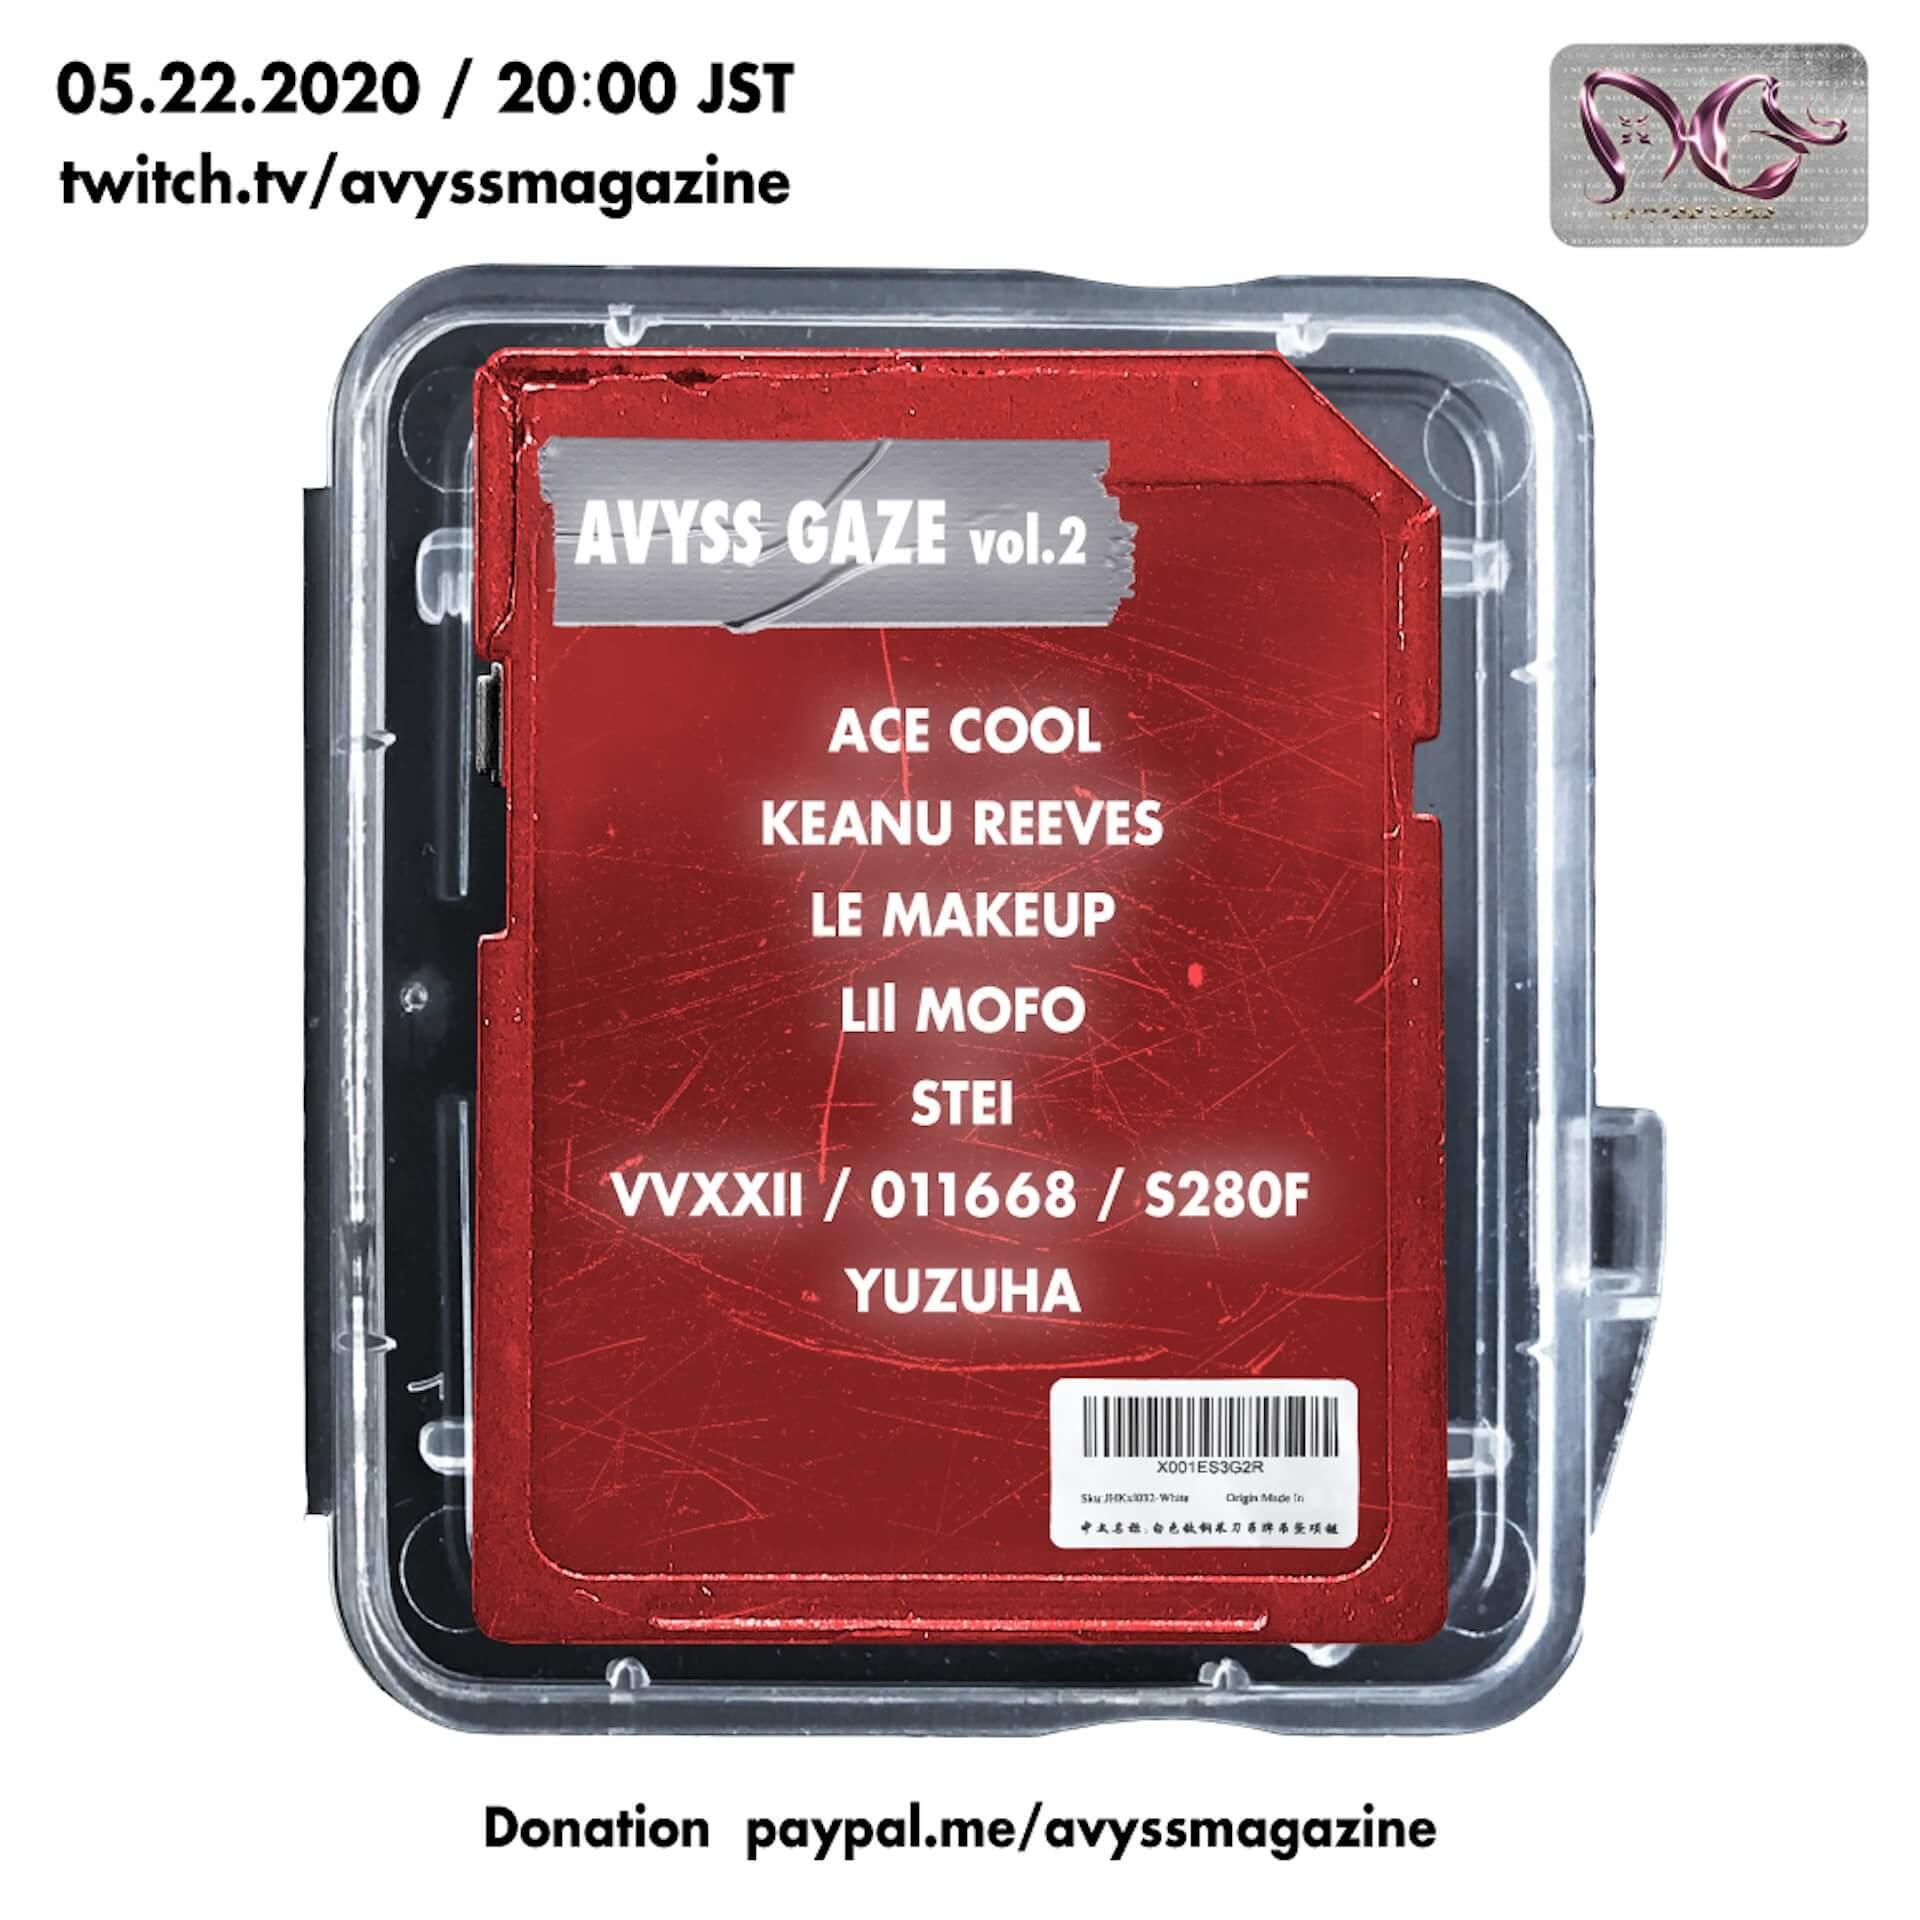 ACE COOL出演のバーチャル配信<AVYSS GAZE>第2弾が開催!第1弾のバーチャルワールドが体験できるVRプログラムも公開 music200515_avyssgaze2_02